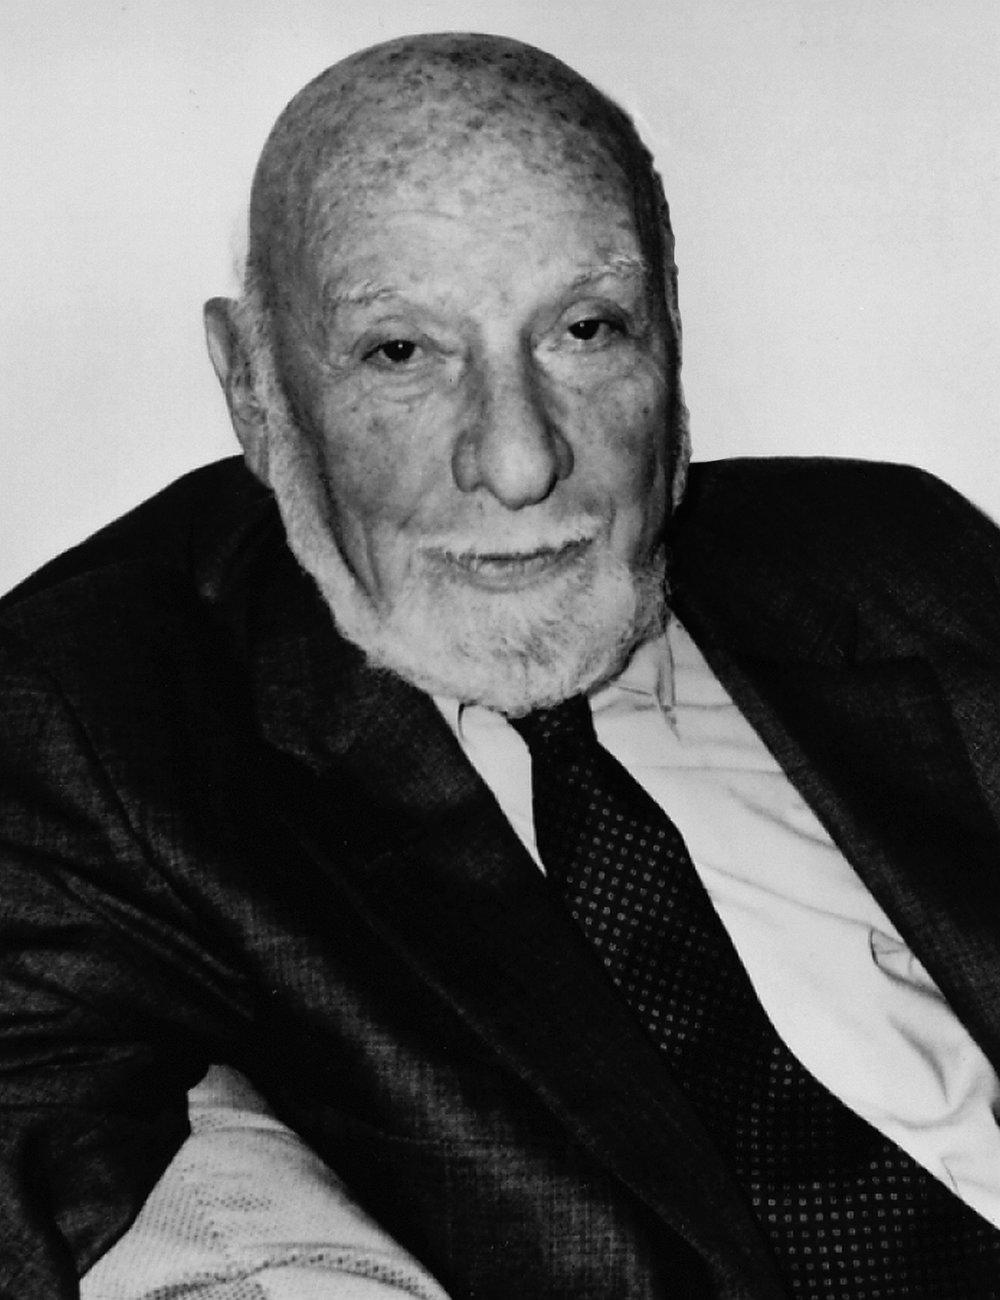 Lawrence K. Schnadig